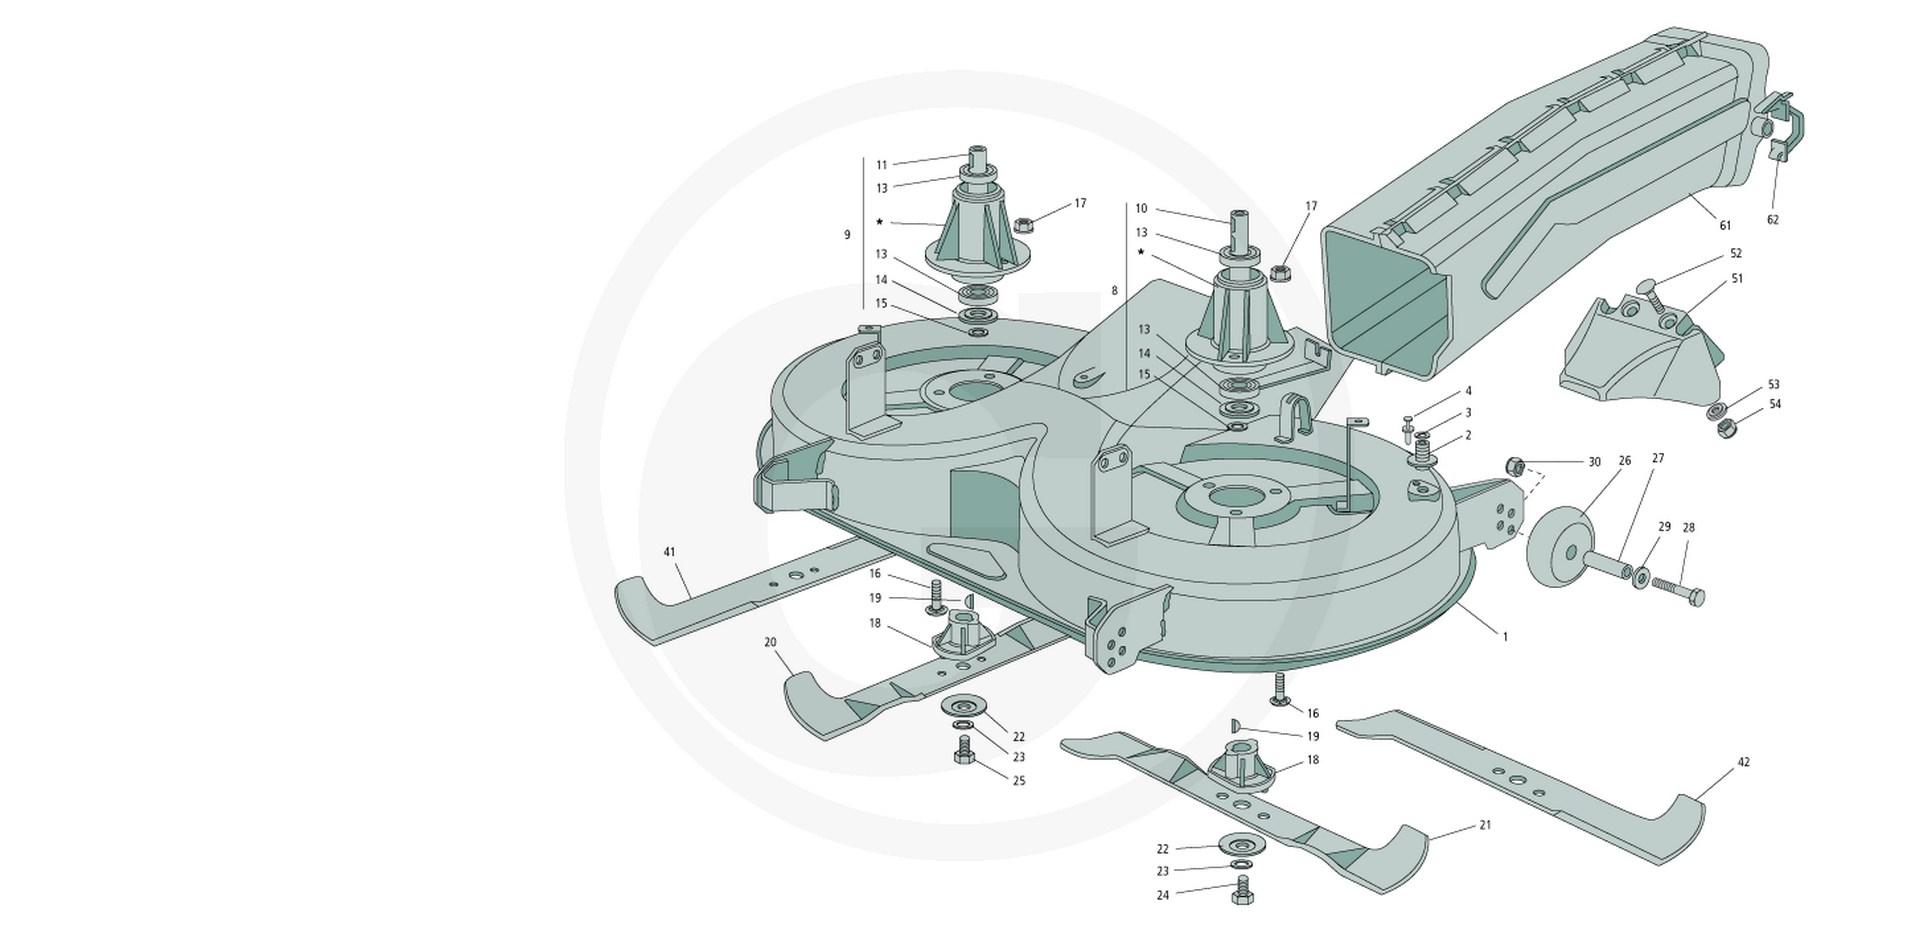 ersatzteil mulchmesser f r gartenland rasentraktor xt 165. Black Bedroom Furniture Sets. Home Design Ideas